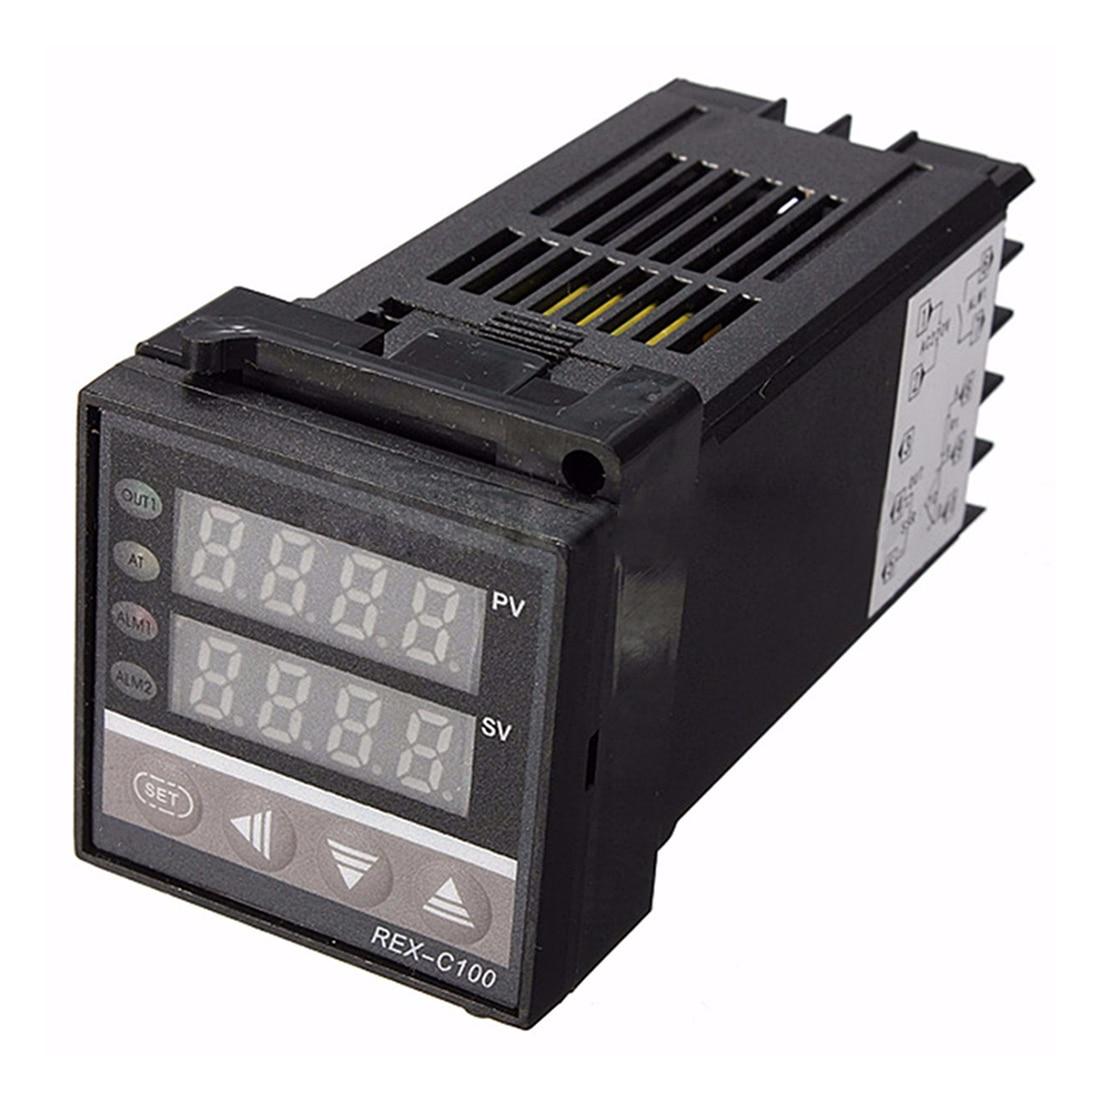 Image 3 - Digital 220V PID REX C100 Temperature Controller + max.40A SSR + K Thermocouple, PID Controller Set + Heat Sinkrex-c100 temperature controllerpid rex-c100pid controller -